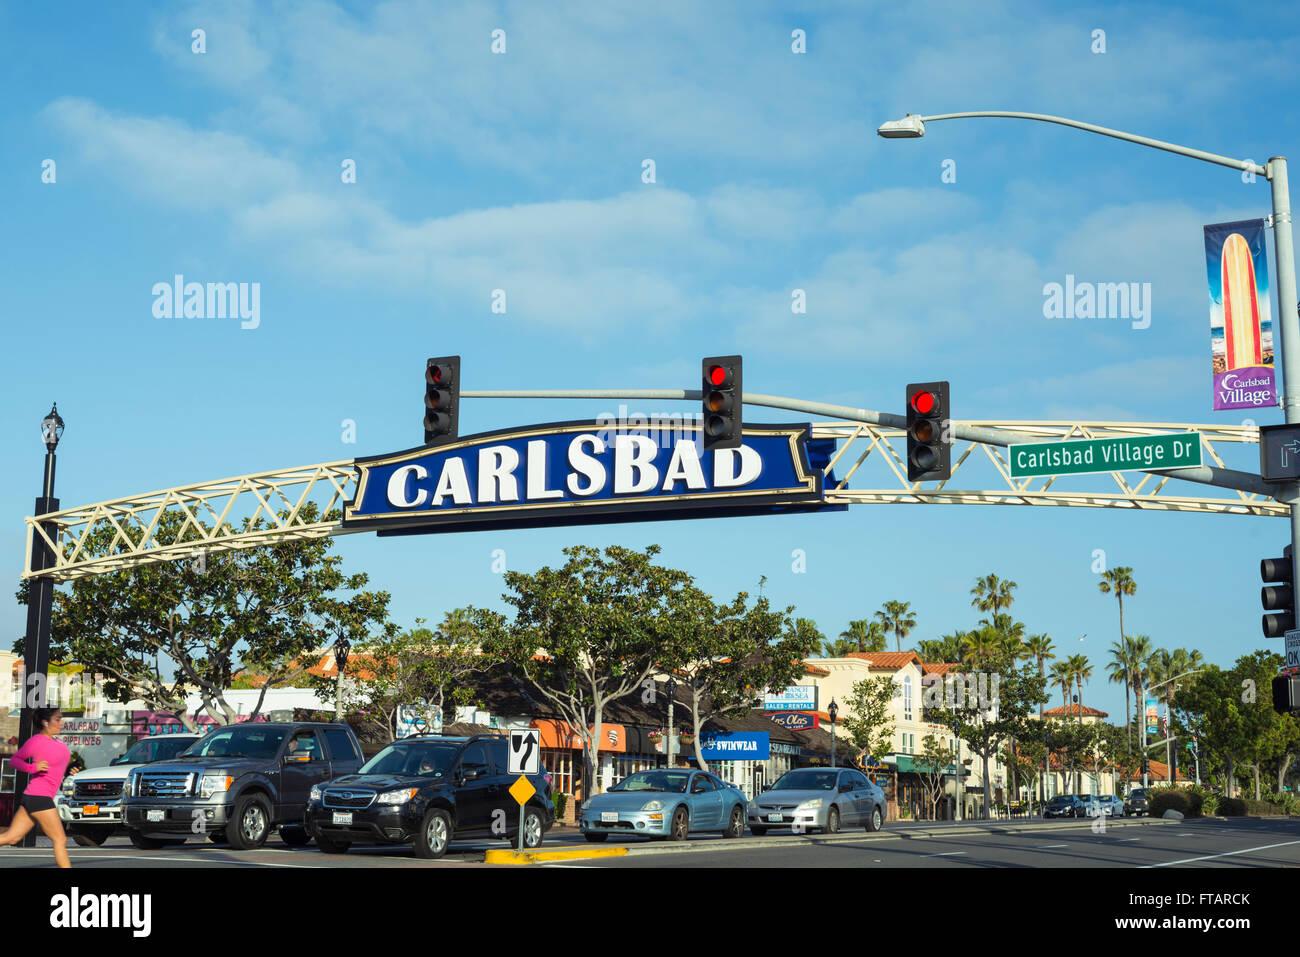 buy lunesta california carlsbad